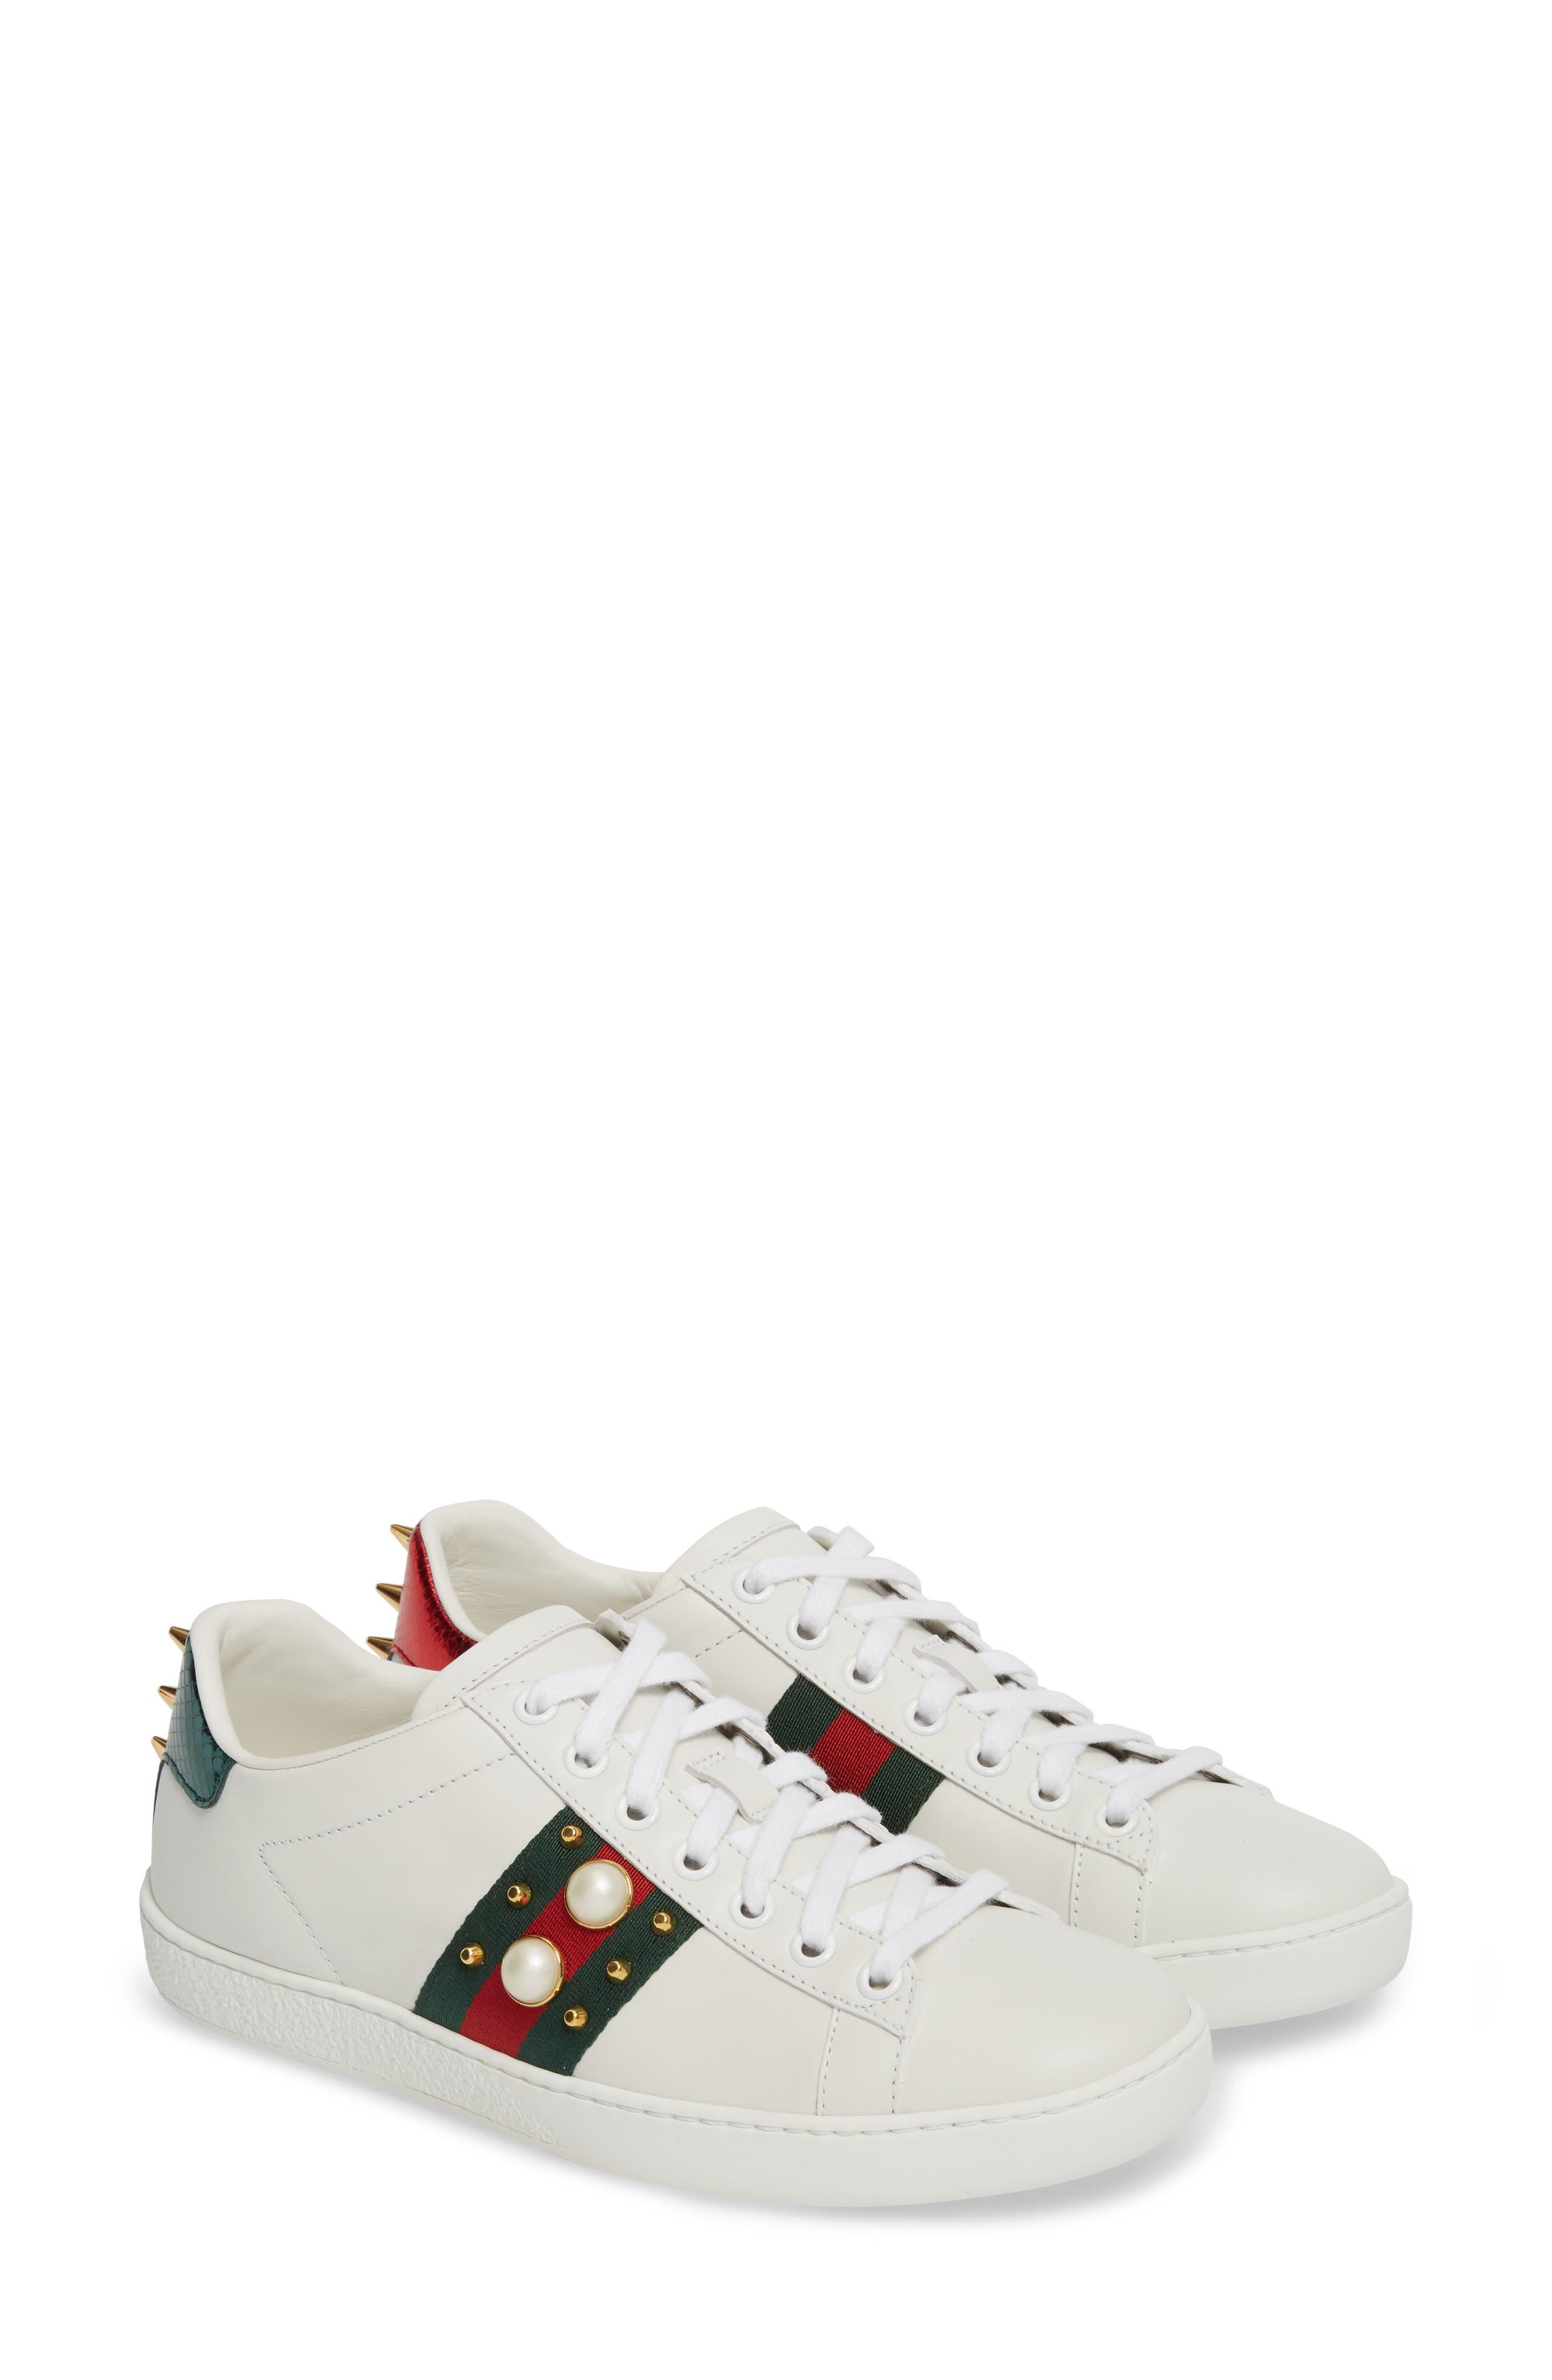 New Ace Low Top Sneaker